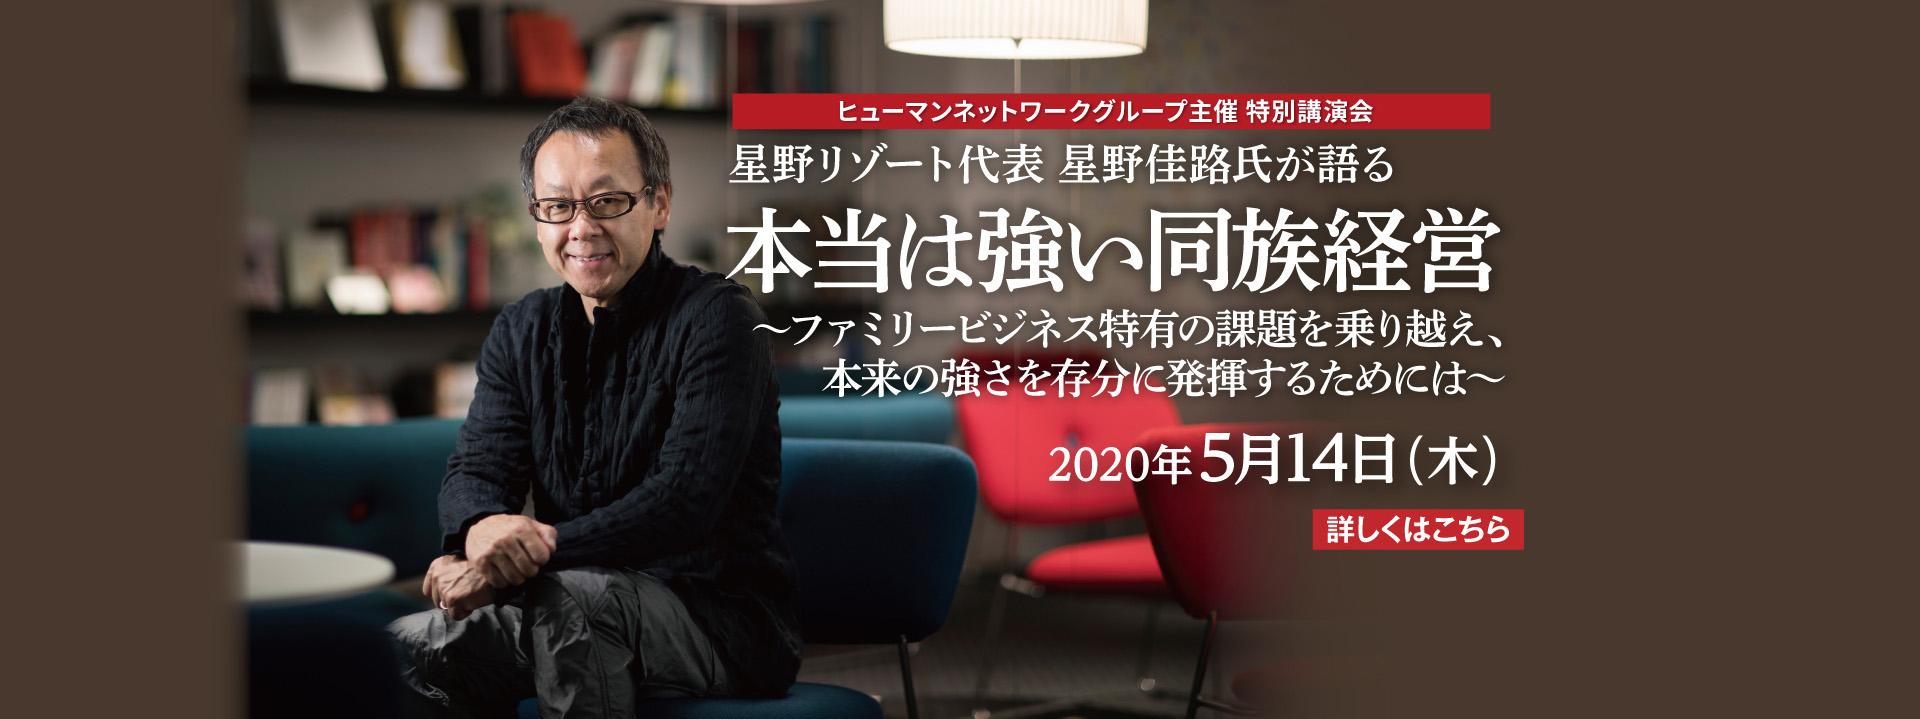 星野佳路氏特別講演会「本当は強い同族経営」